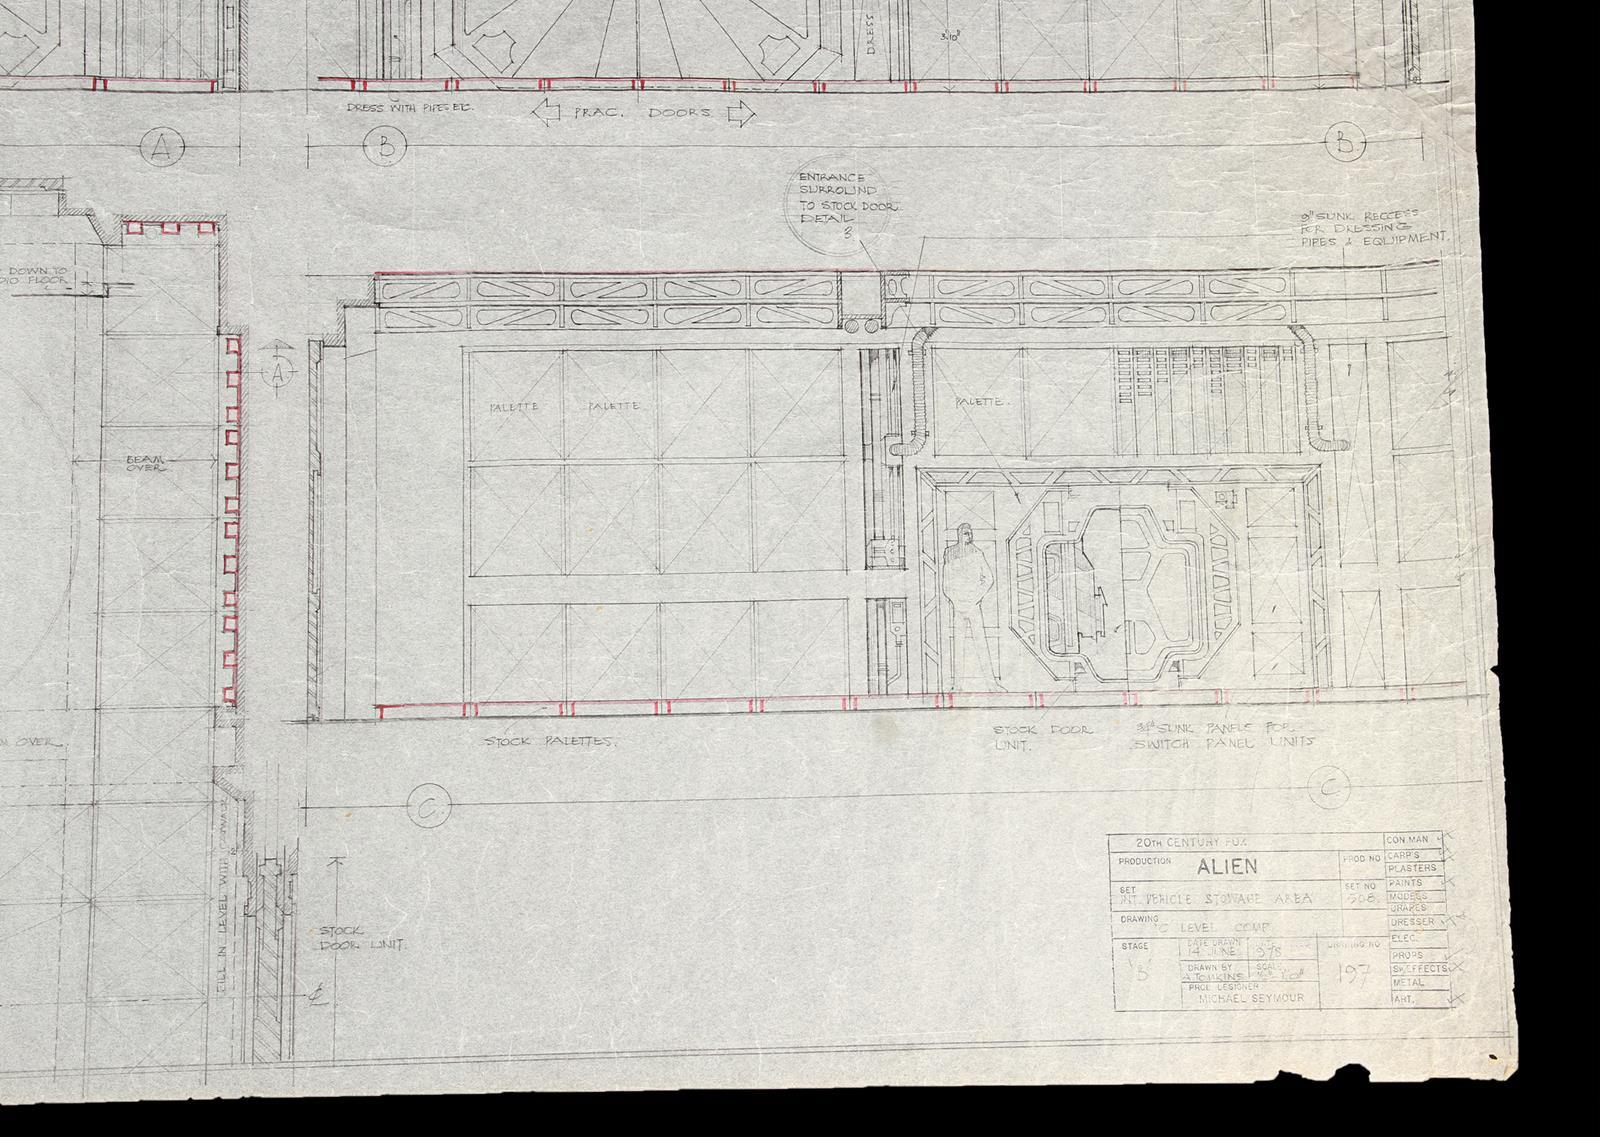 ALIEN (1979) - Hand-Drawn Nostromo Hangar Pencil Illustration A hand-drawn pencil set illustration - Image 9 of 11